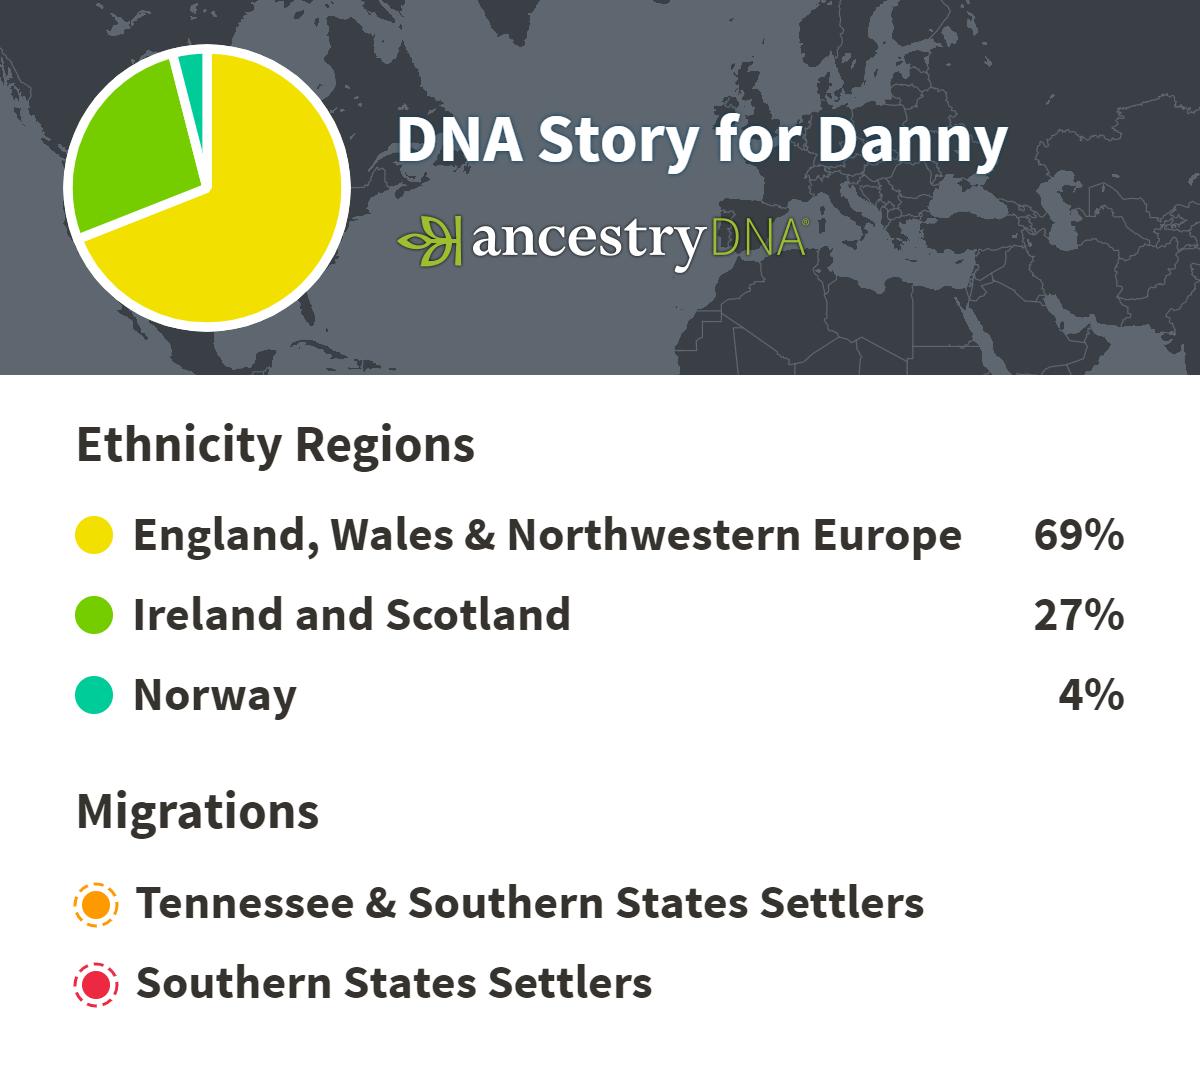 DNA Origins Ancestry dna, Family history, England ireland